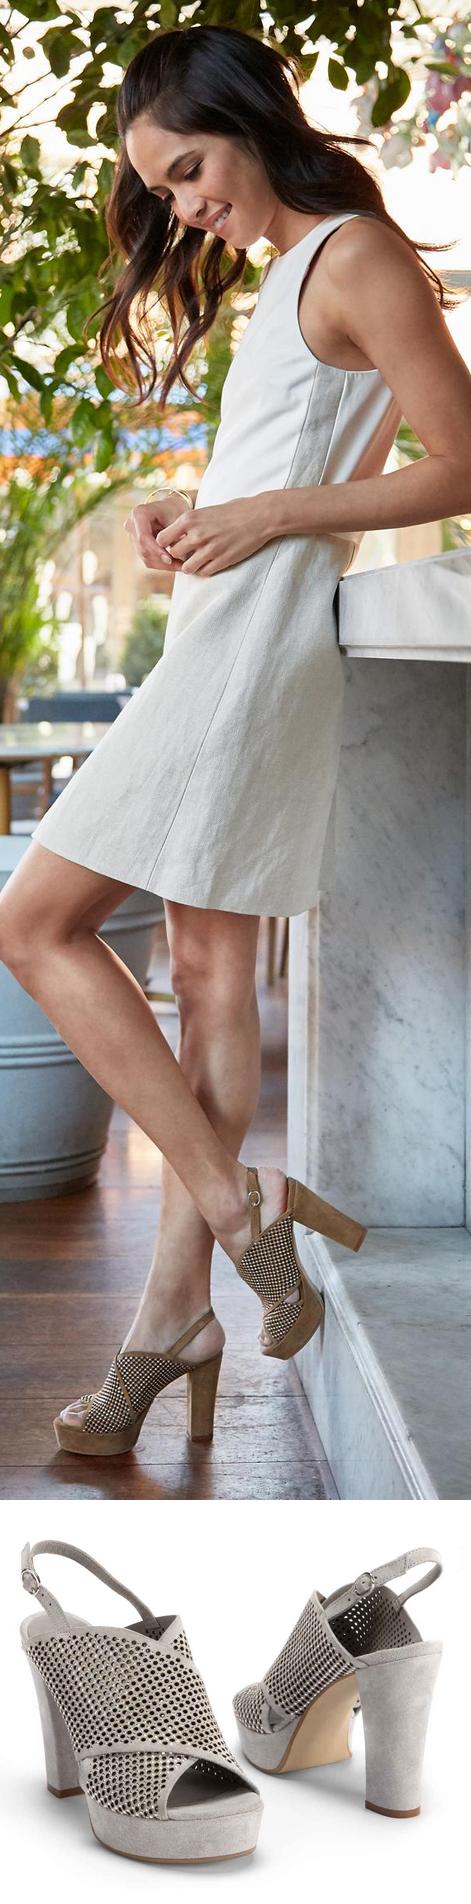 M. Gemi Italian Shoes | Cintola